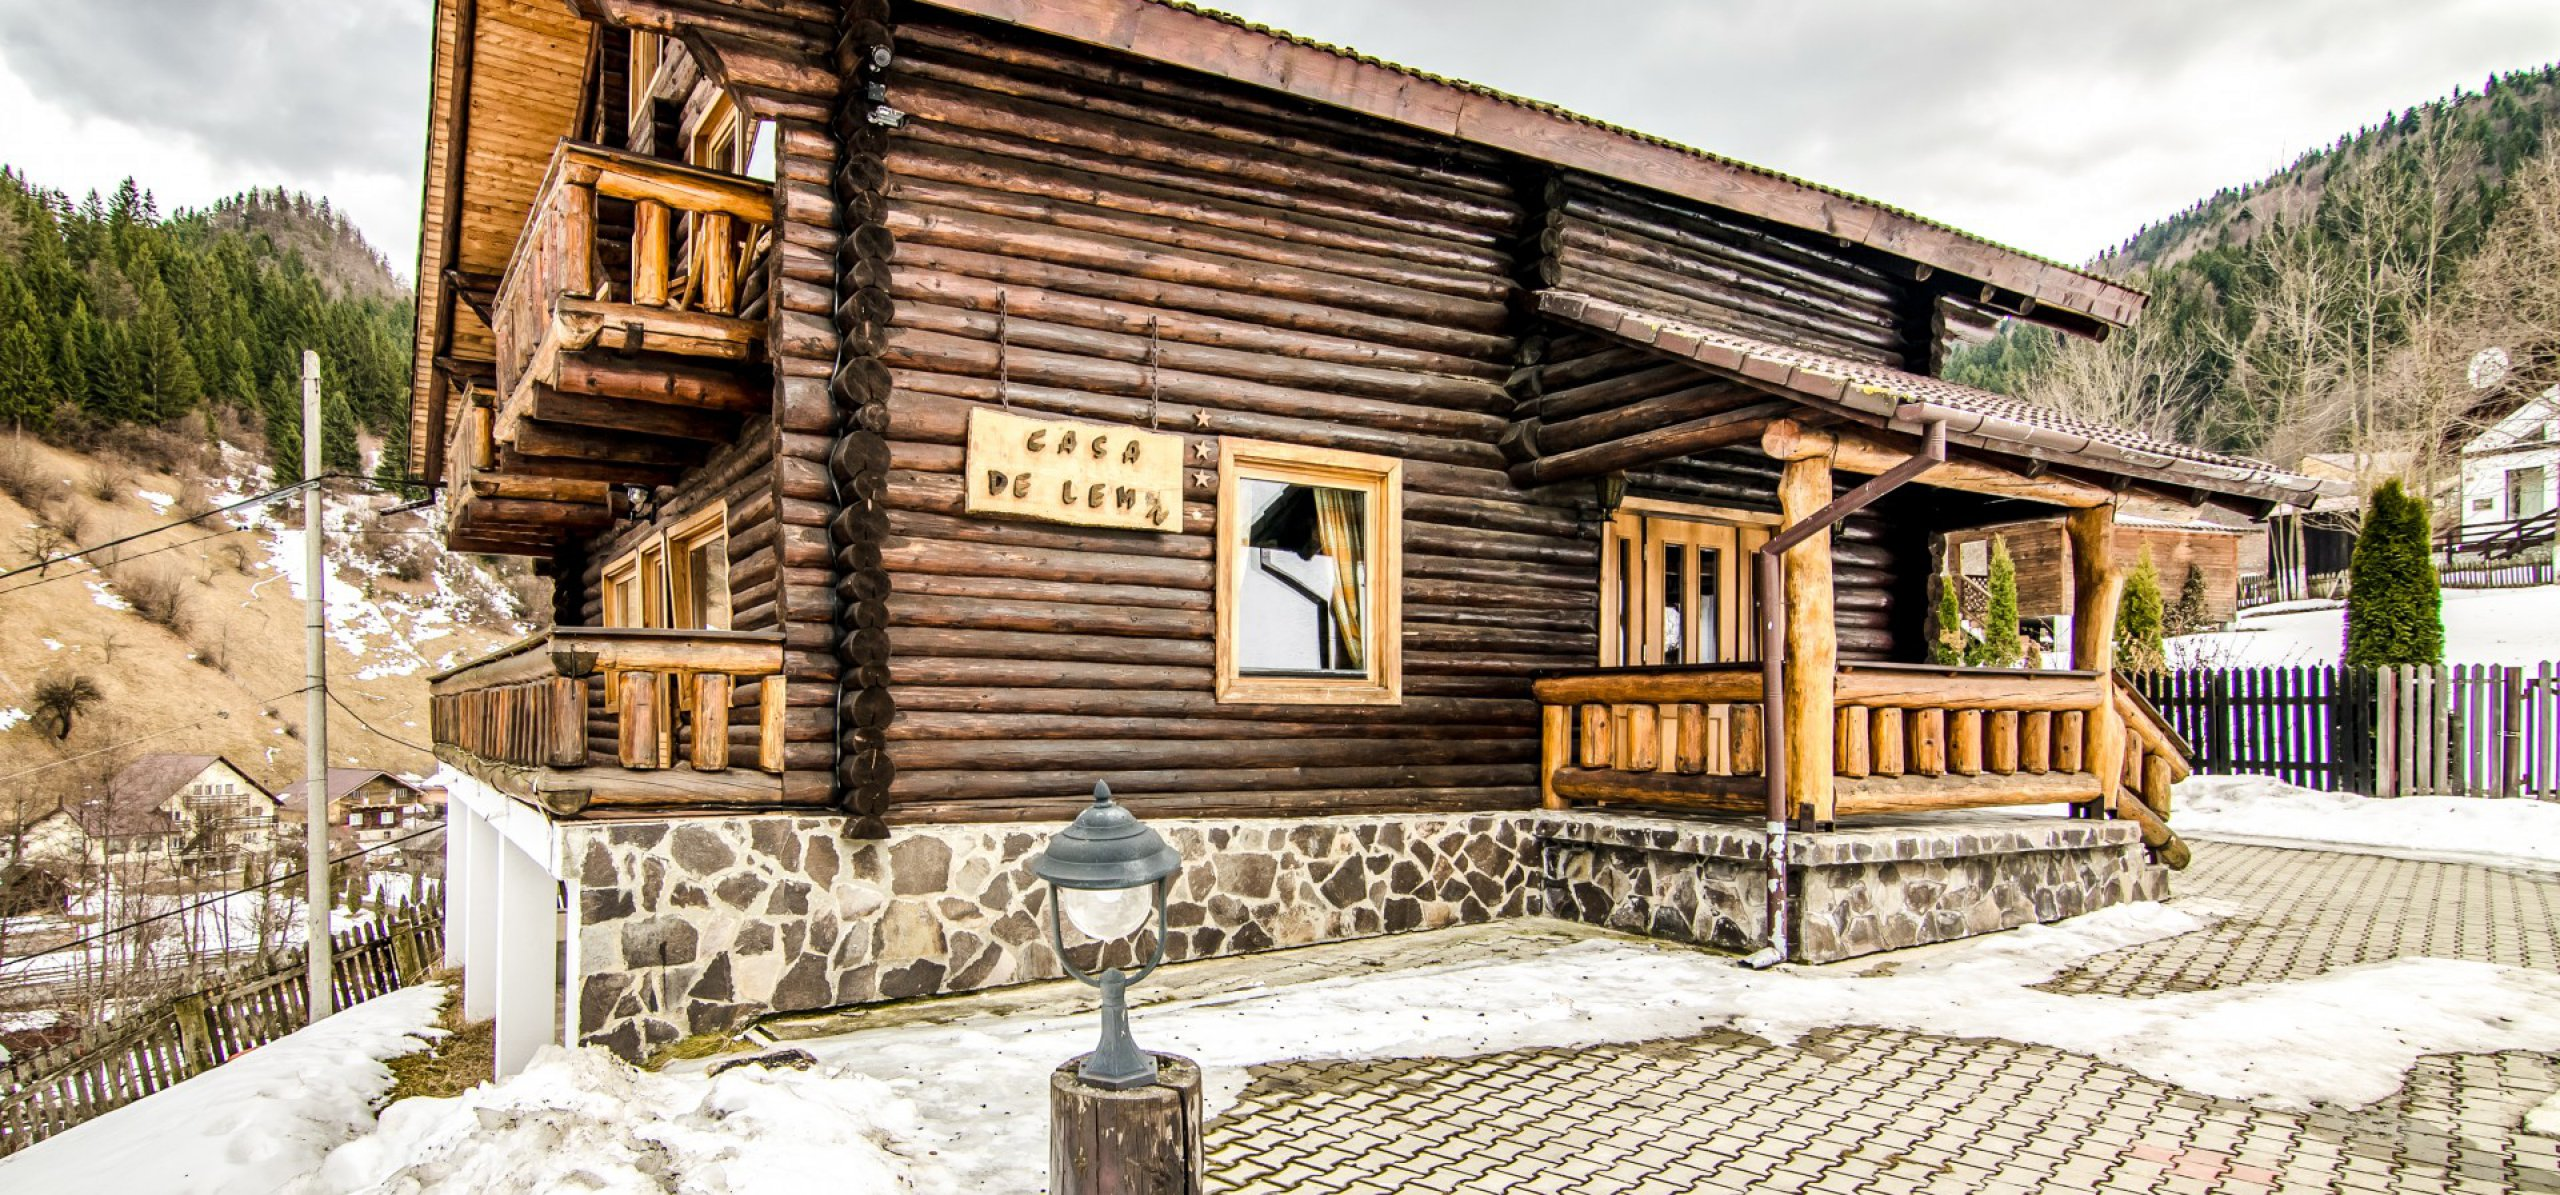 vila-de-lemn-iarna-cazare-in-moeciu